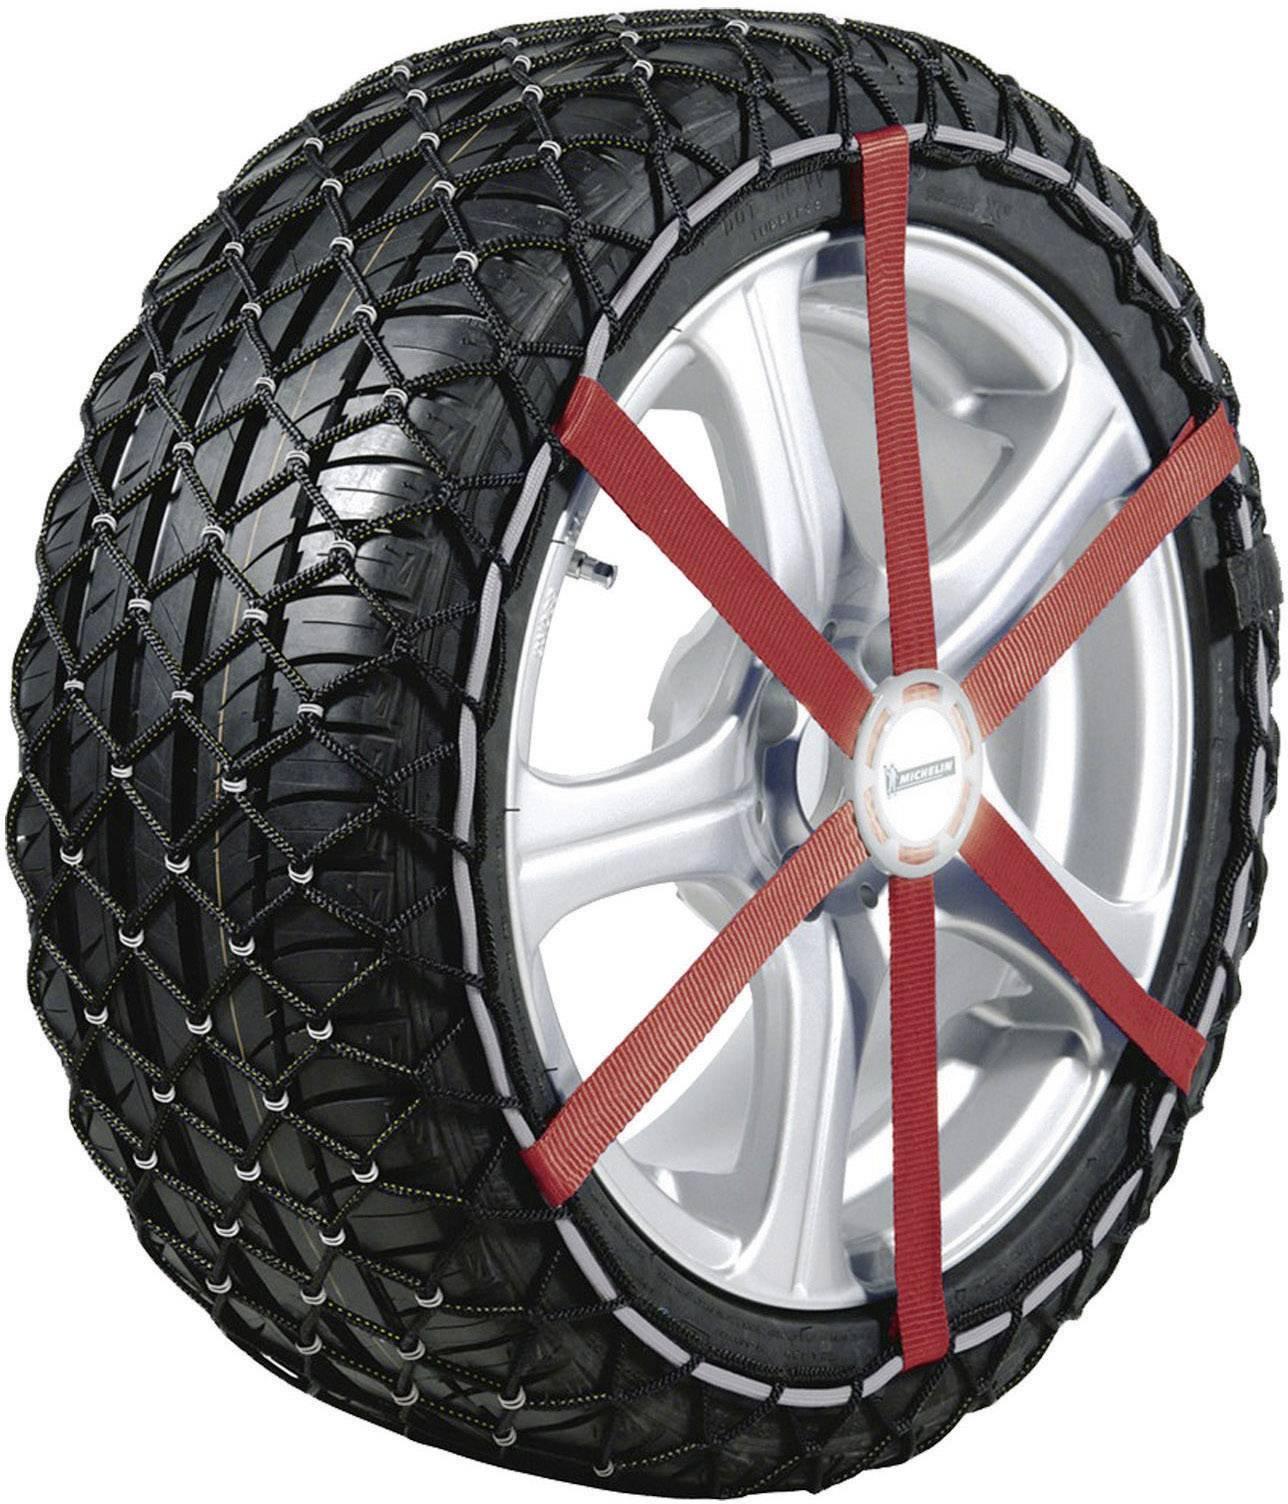 Kompozitný materiál Michelin Easy Grip L12